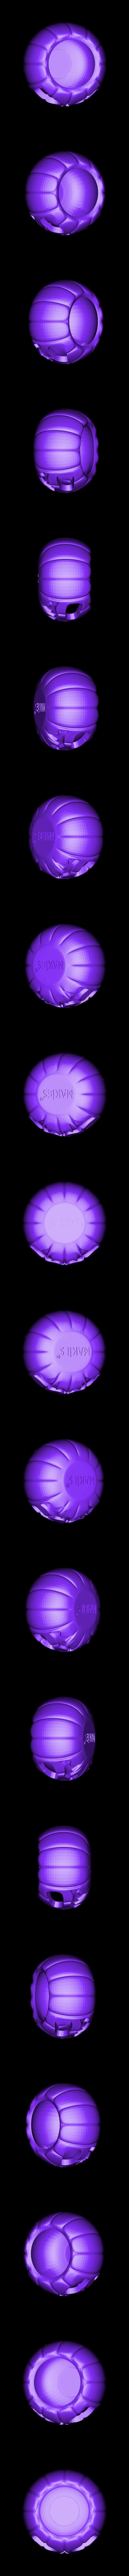 MAKIES_Jack_O_Lantern_Body.STL Download free STL file Makies Jack-O-Lantern • Model to 3D print, Makies